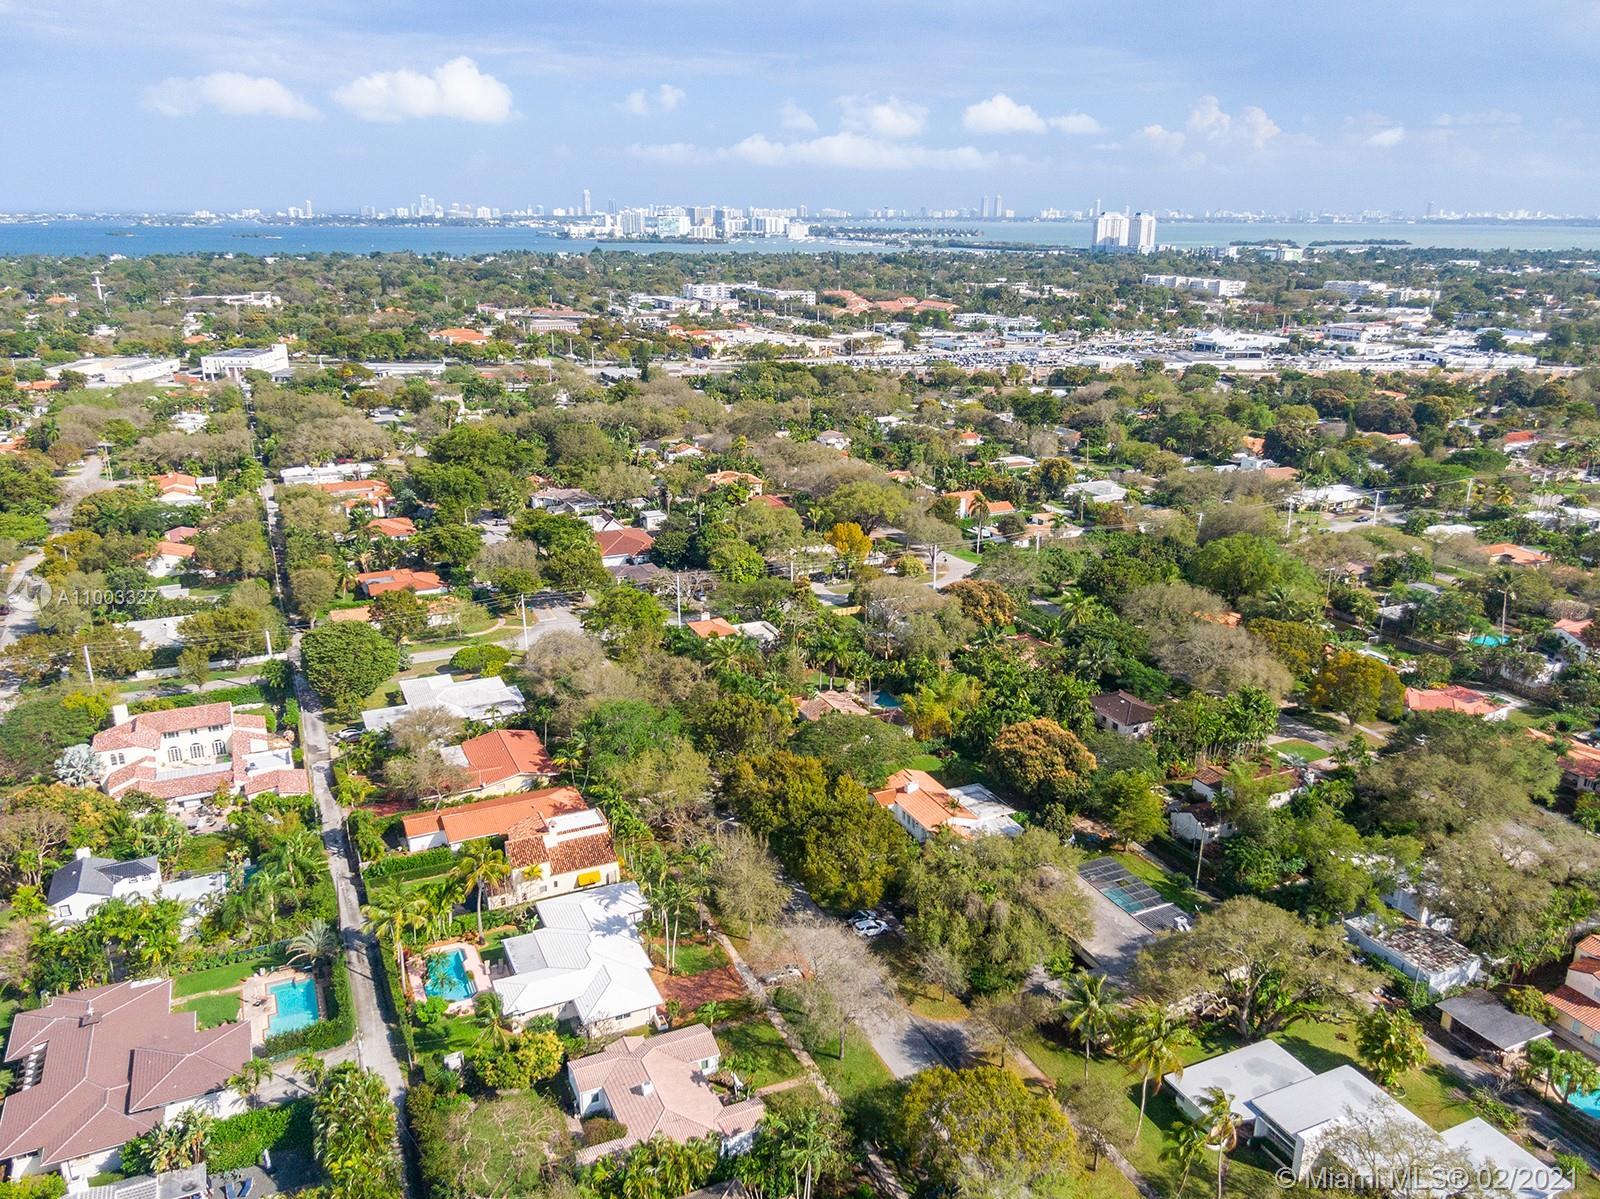 Miami Shores # - 34 - photo